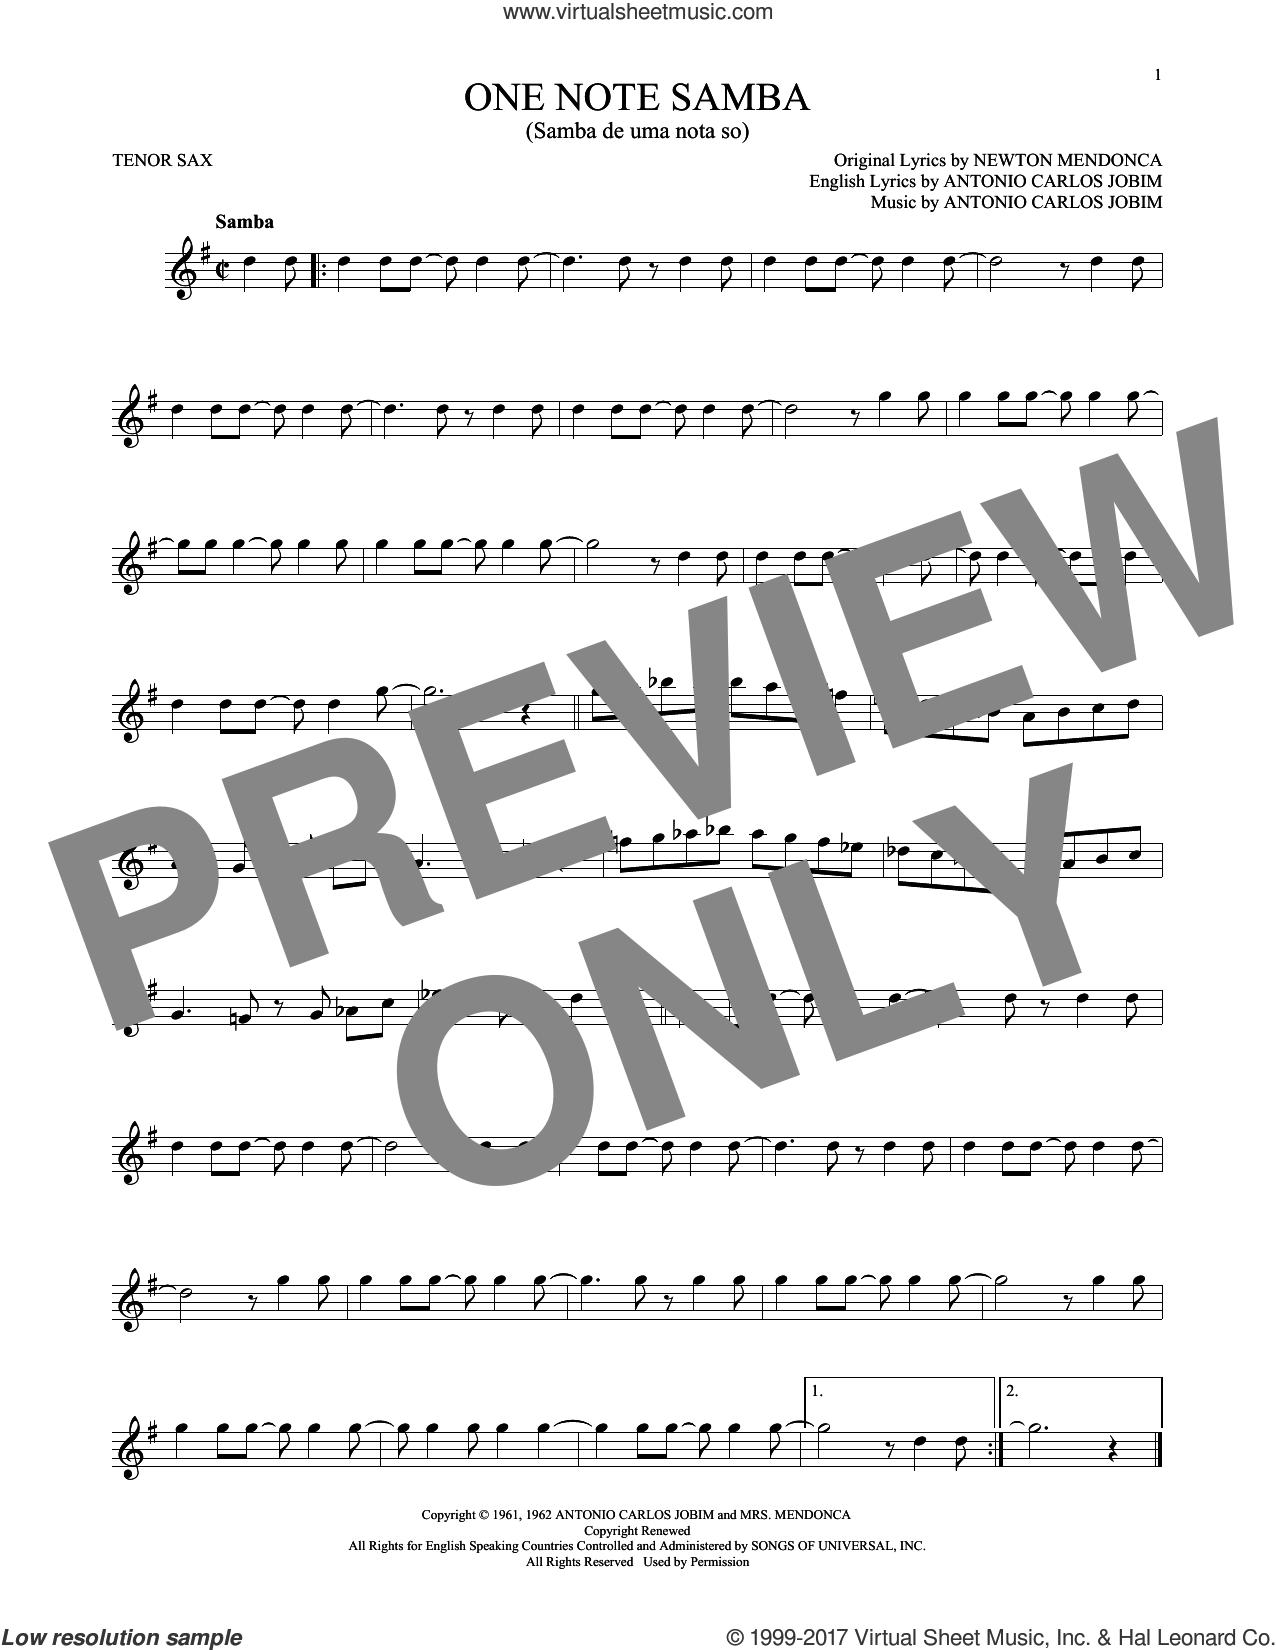 One Note Samba (Samba De Uma Nota So) sheet music for tenor saxophone solo by Antonio Carlos Jobim, Pat Thomas and Newton Mendonca, intermediate skill level